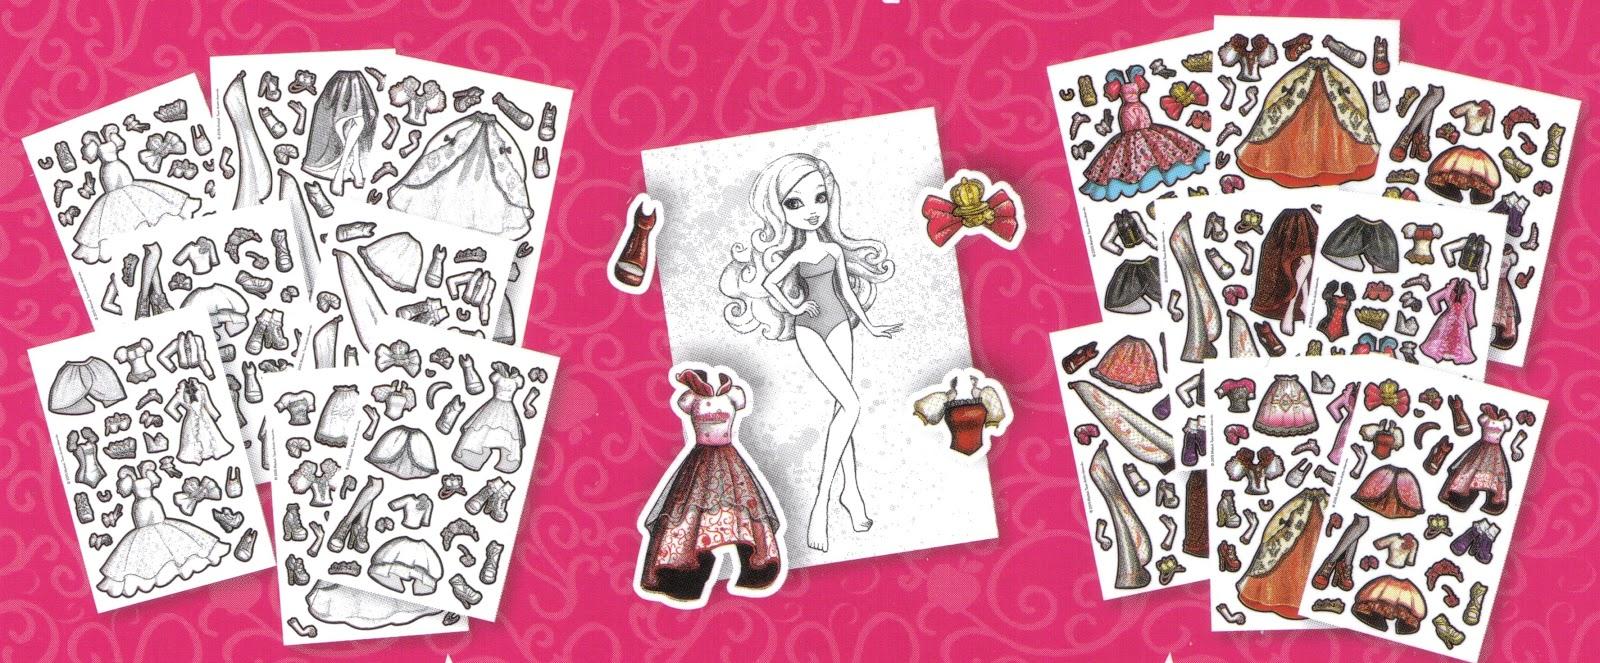 Бумажные Куклы Для Печати